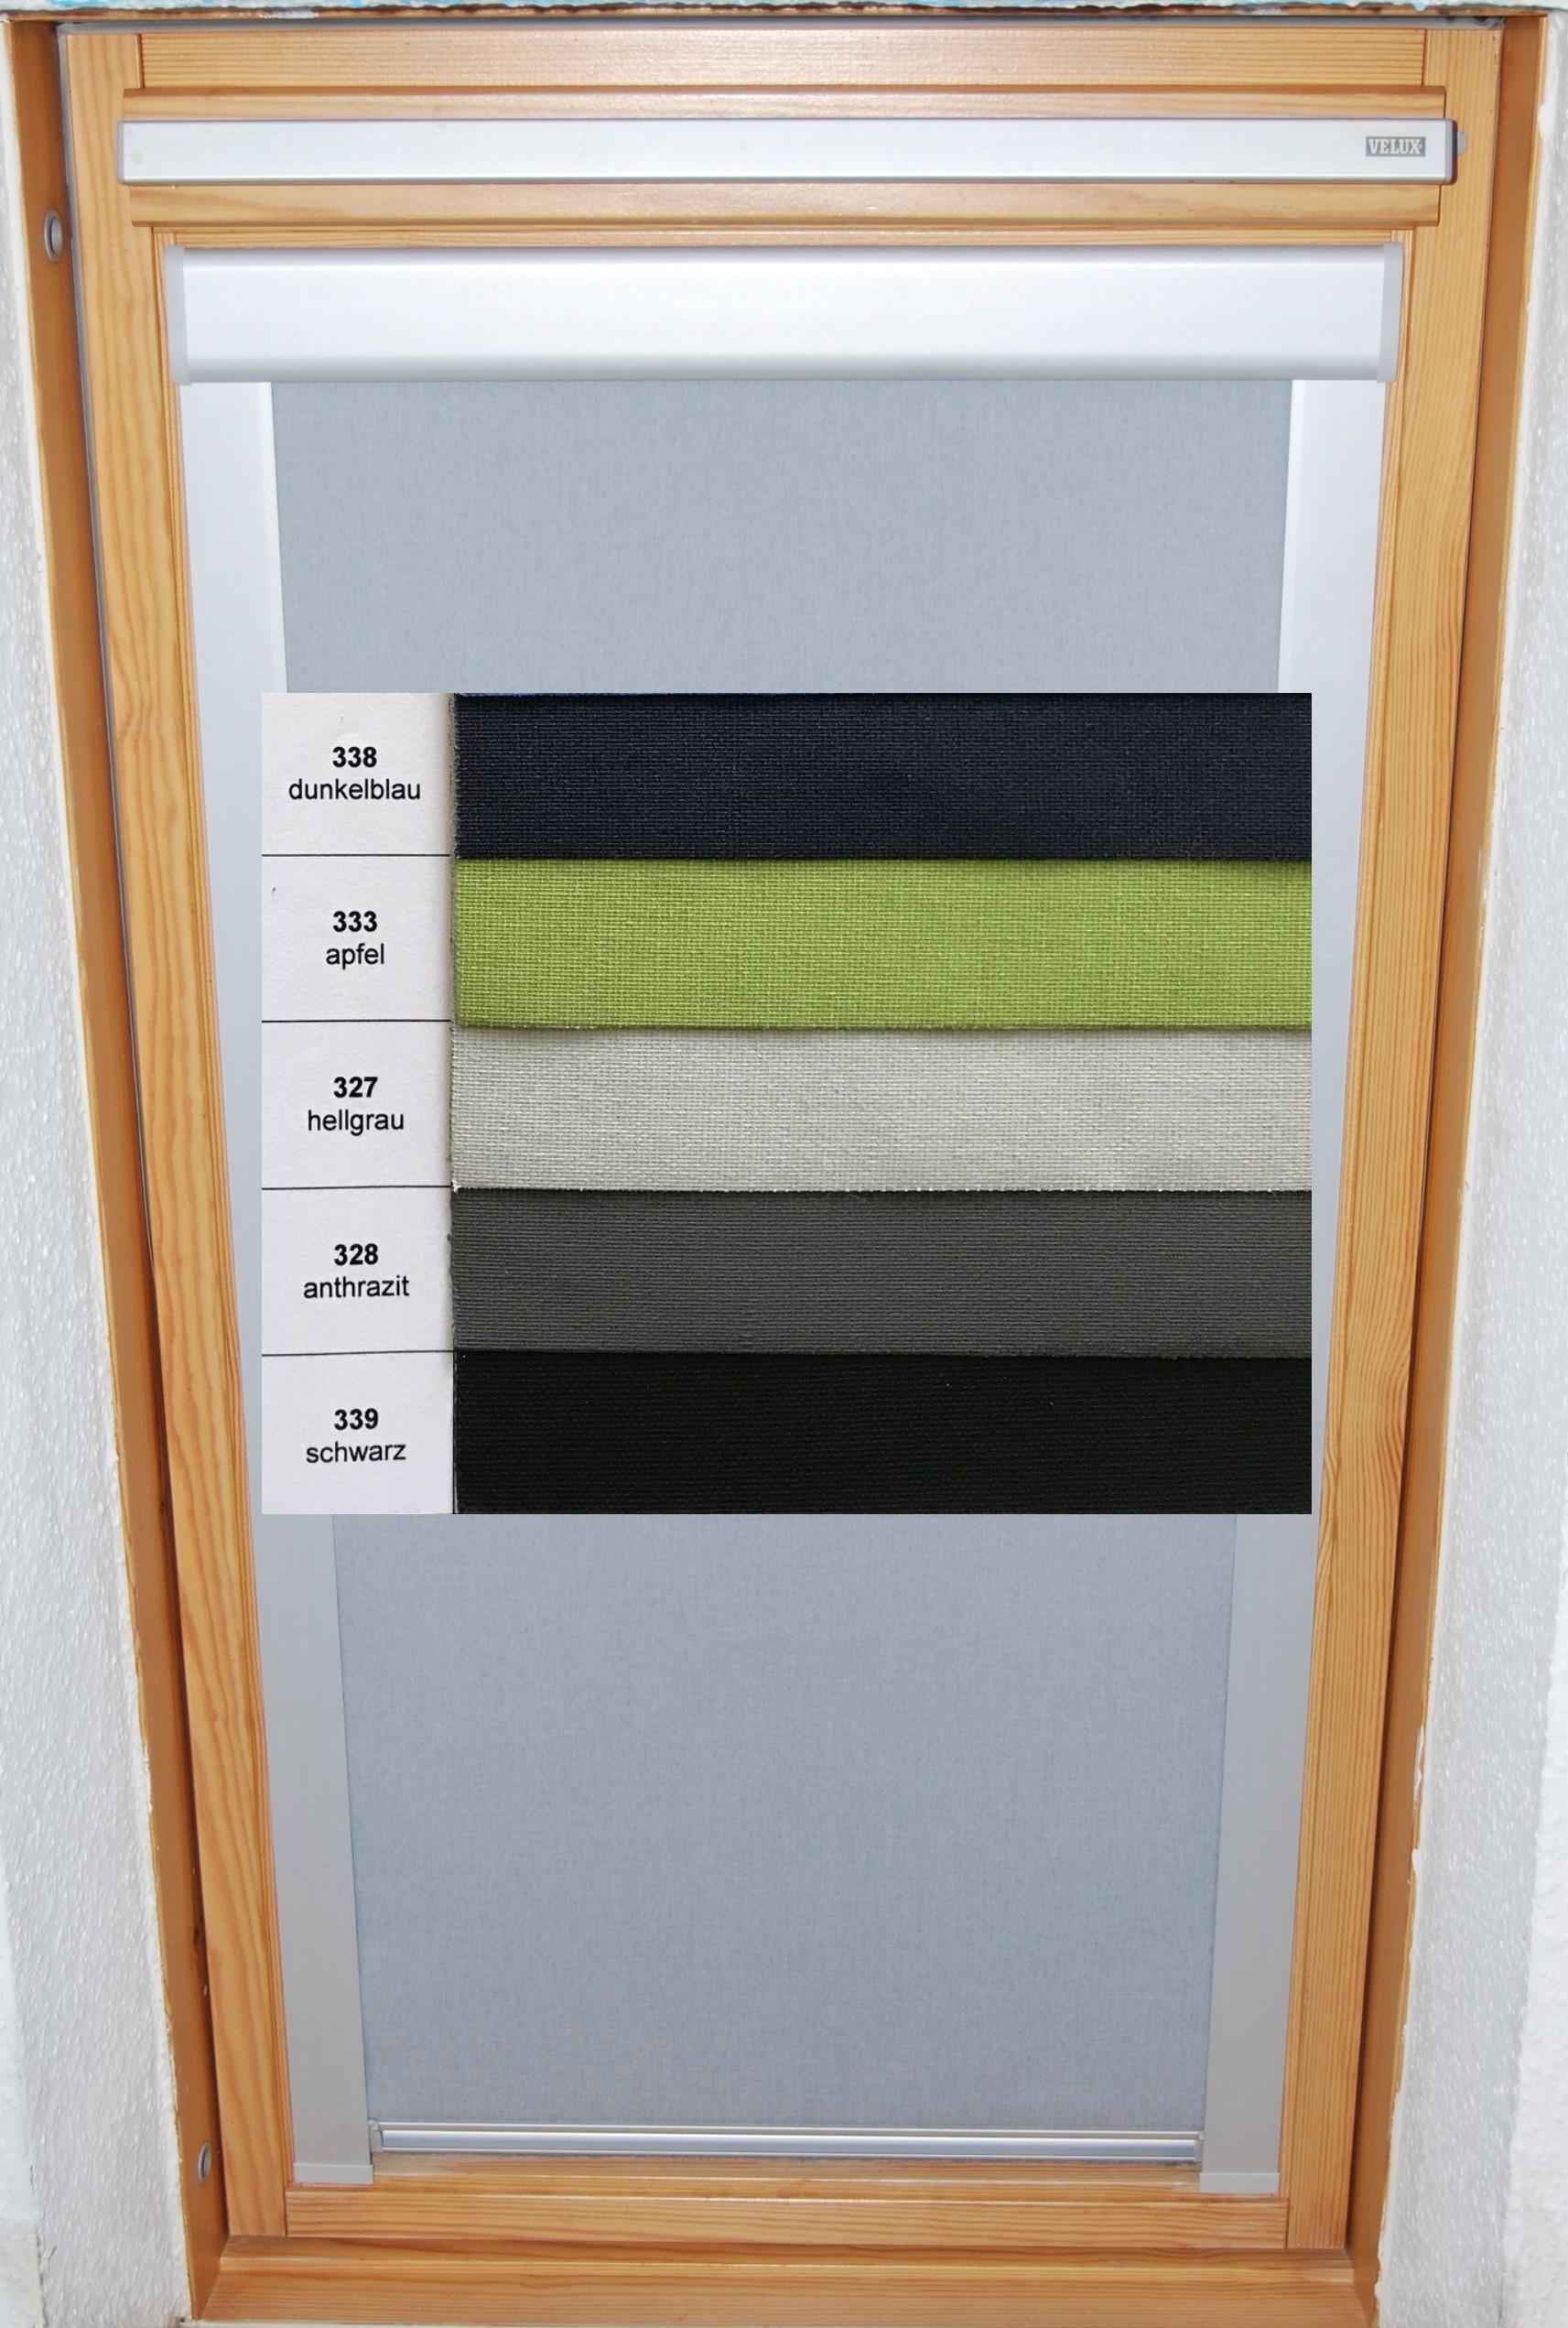 dachfenster rollos f r original velux fenster. Black Bedroom Furniture Sets. Home Design Ideas